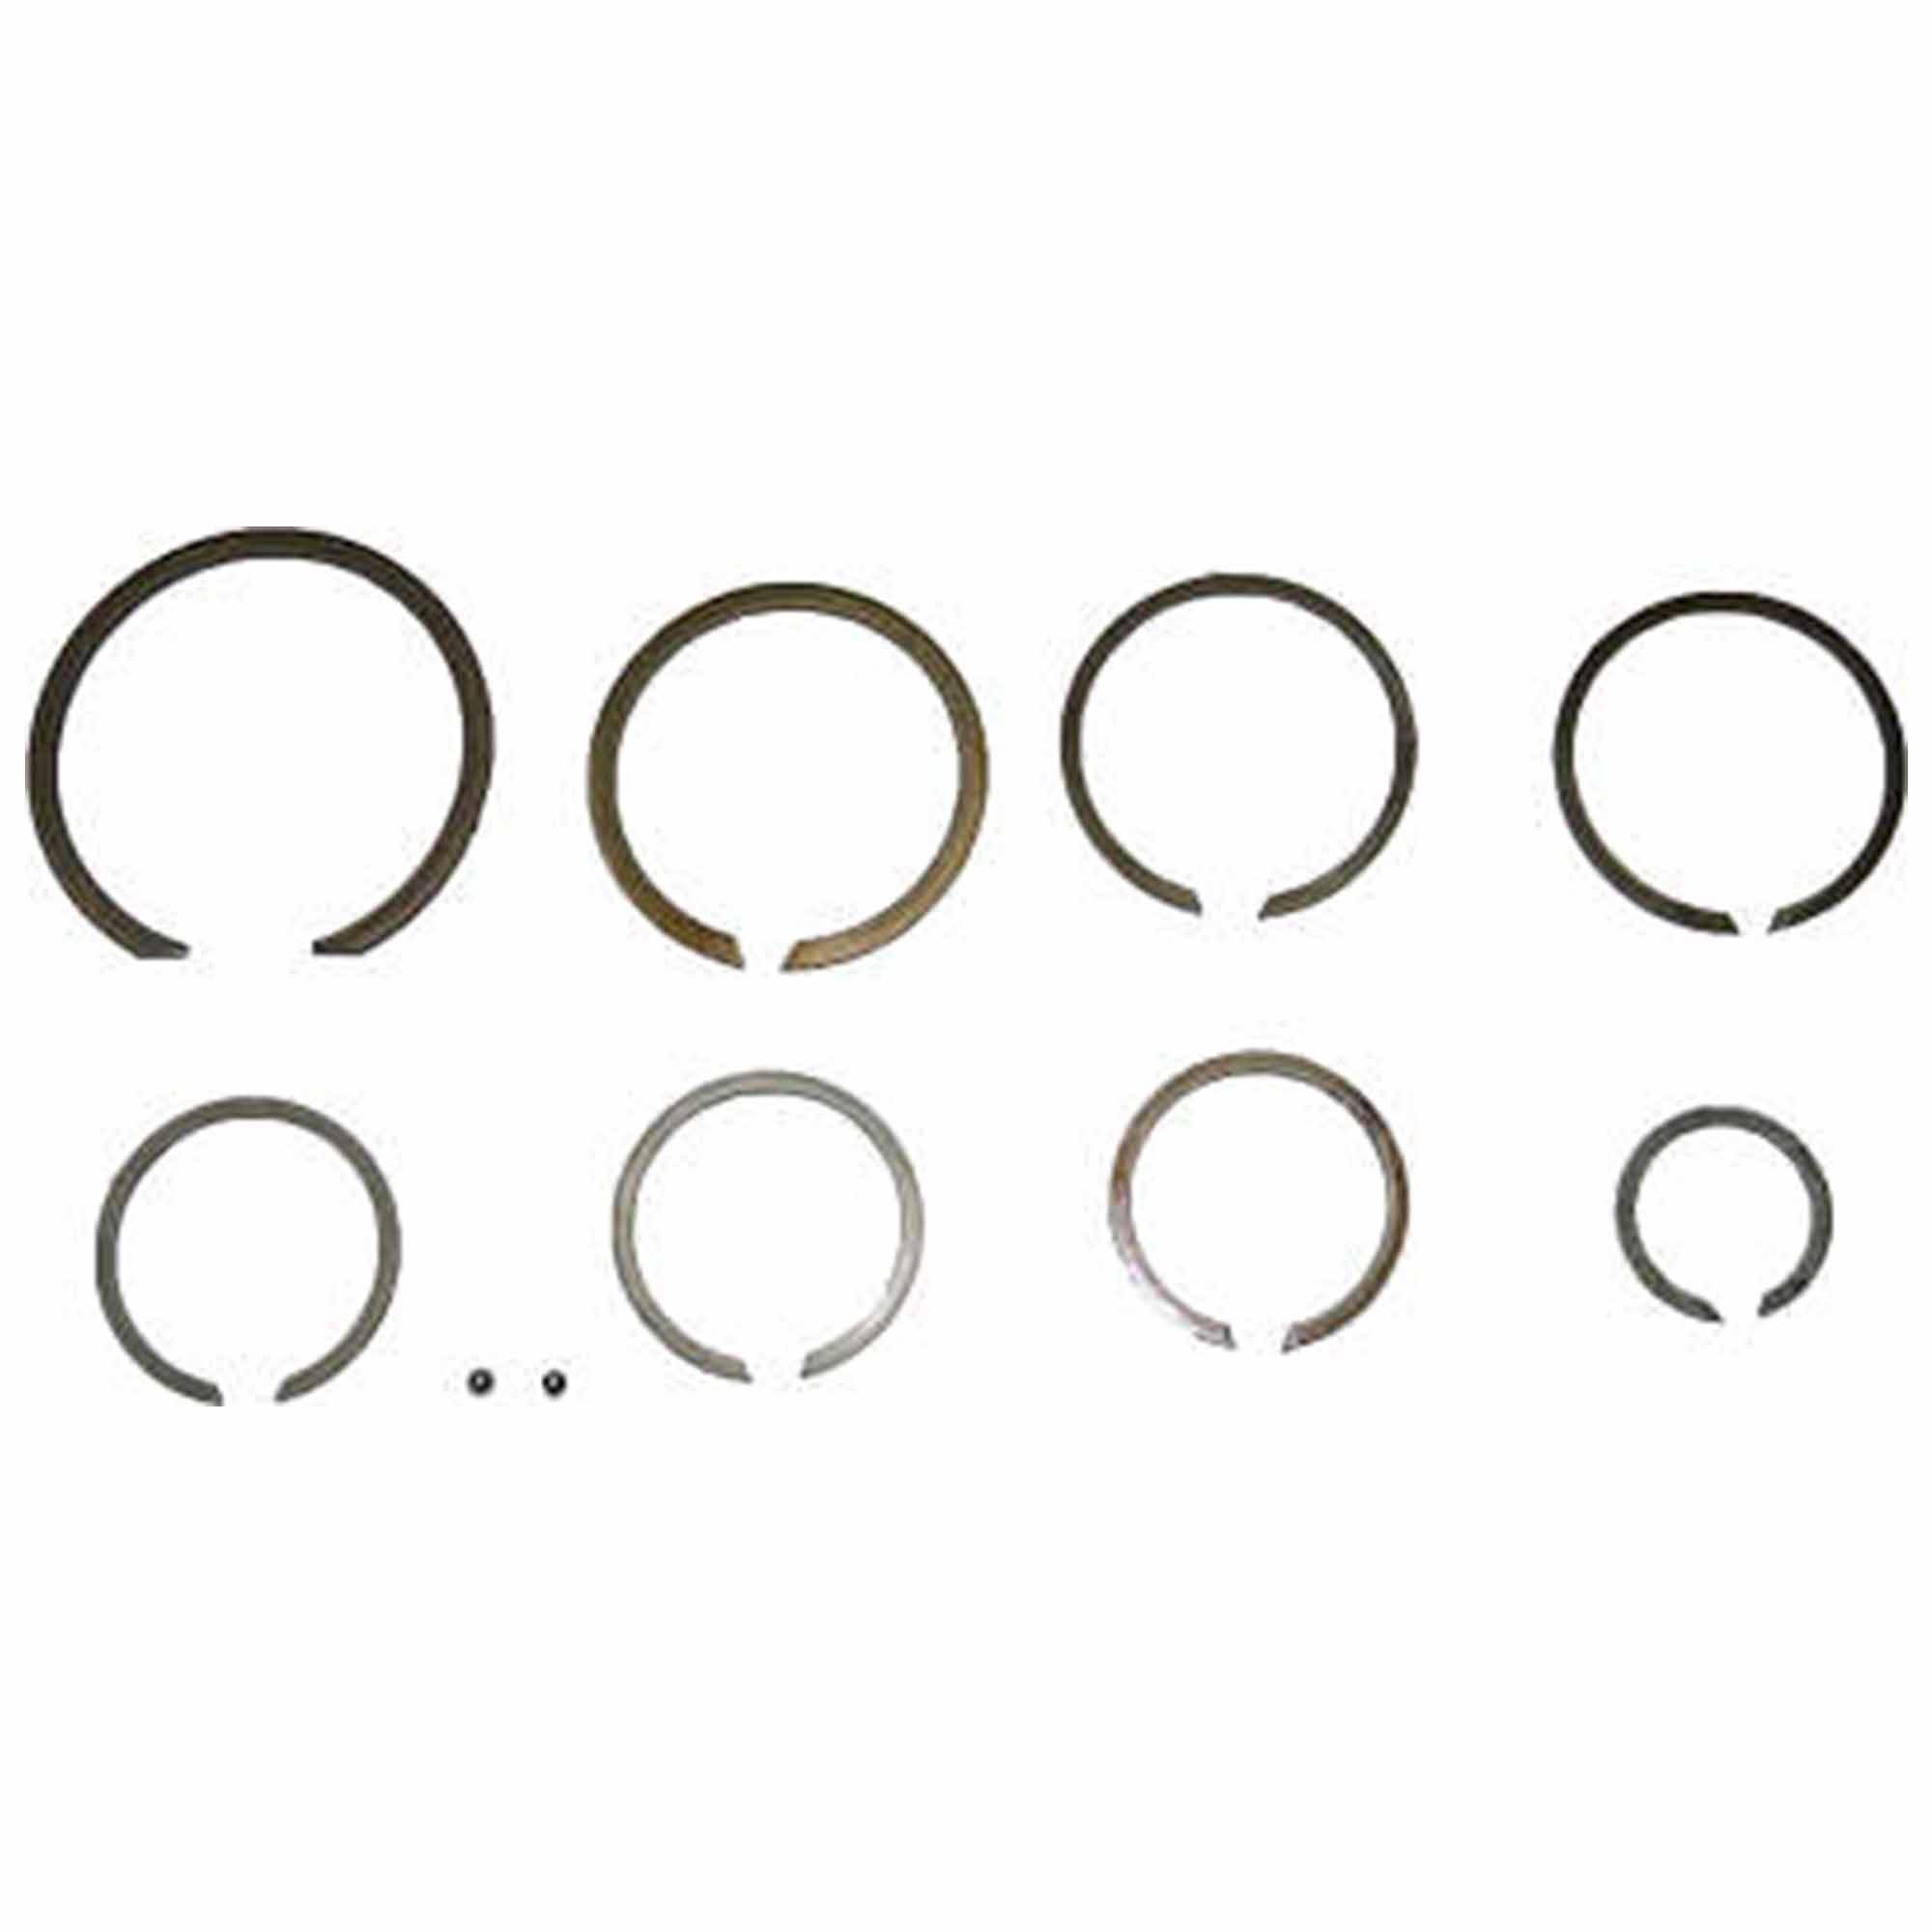 SUK510 - Kit de anéis travas câmbio 6 MARCHAS